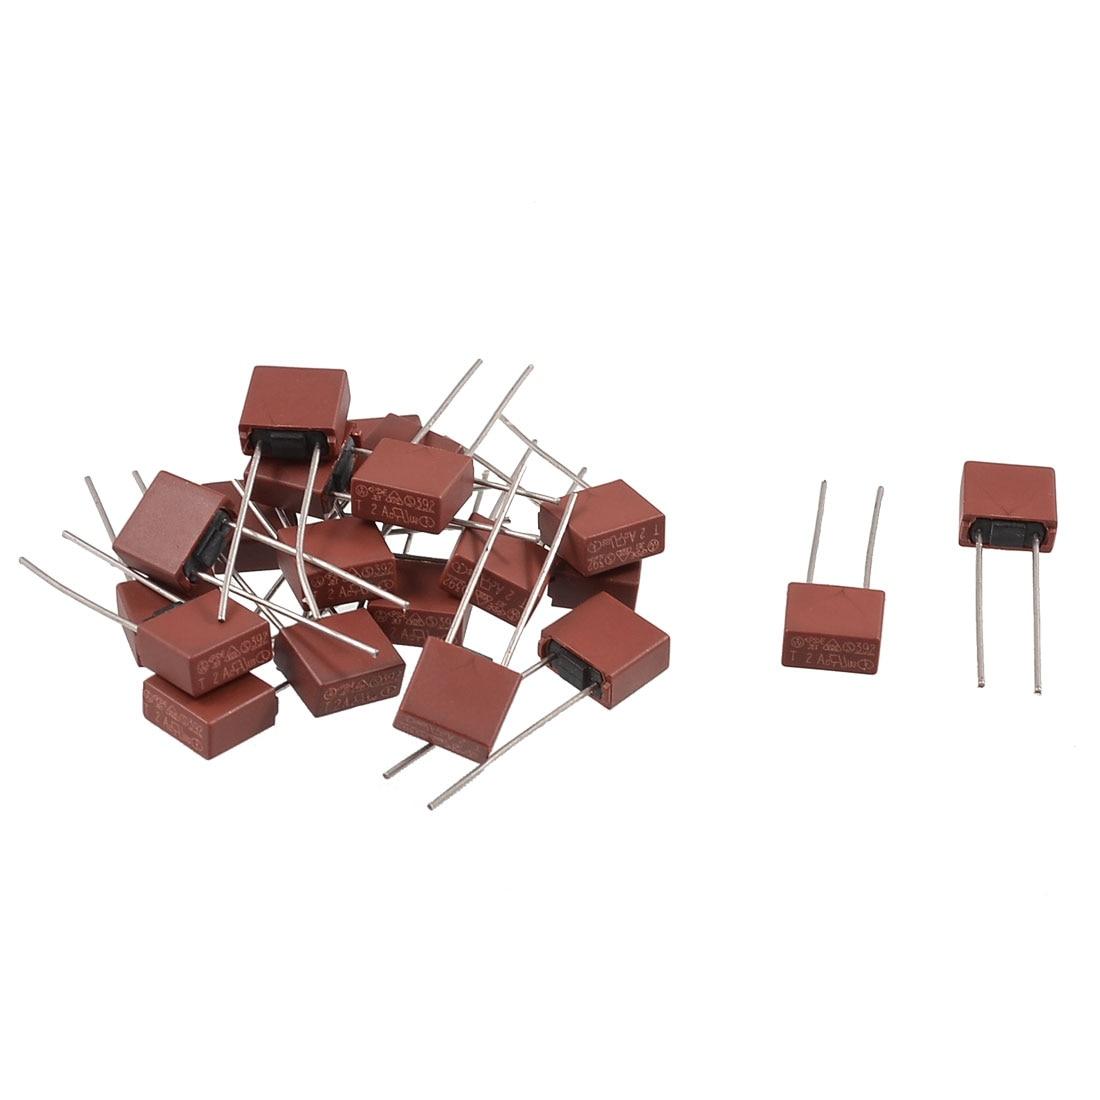 Uxcell 20 шт. 250 В квадратный Тип радиальные приводит миниатюрный Slow Blow Micro предохранитель 0.25a   0.5a   15A   1A   2A   3A   4A   5A   6a